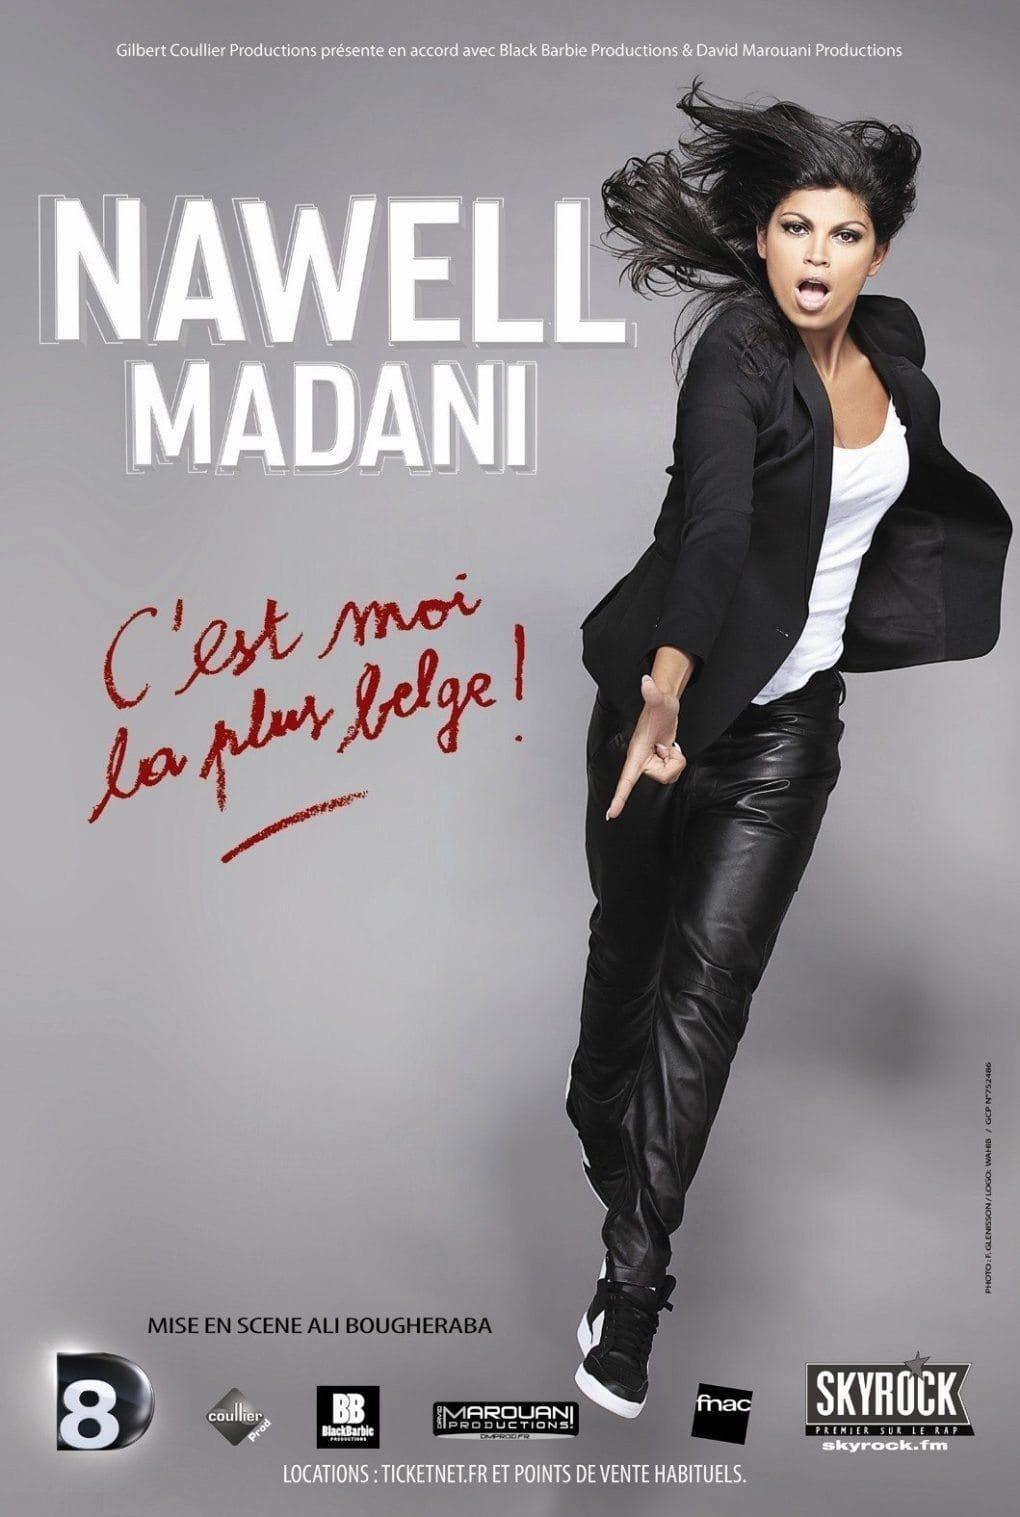 Nawell Madani – C'est moi la plus belge!